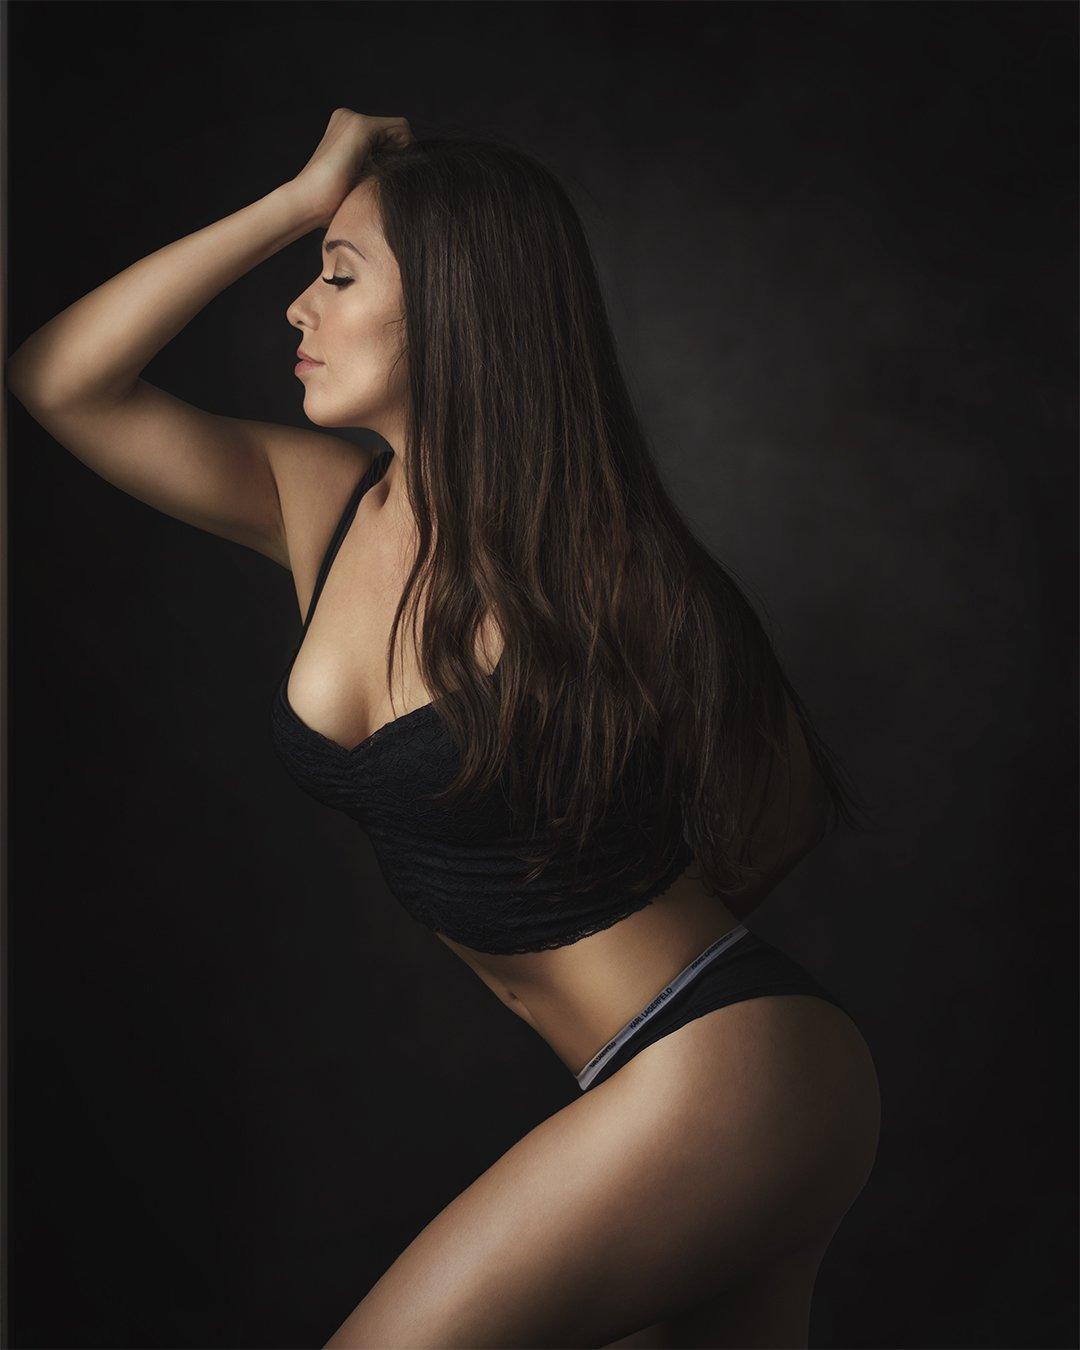 portrait, beauty, beautiful, gorgeous, lovelyface, girl, young, sweetgirl, ramona, jozefkiss, sexygirl, Jozef Kiss